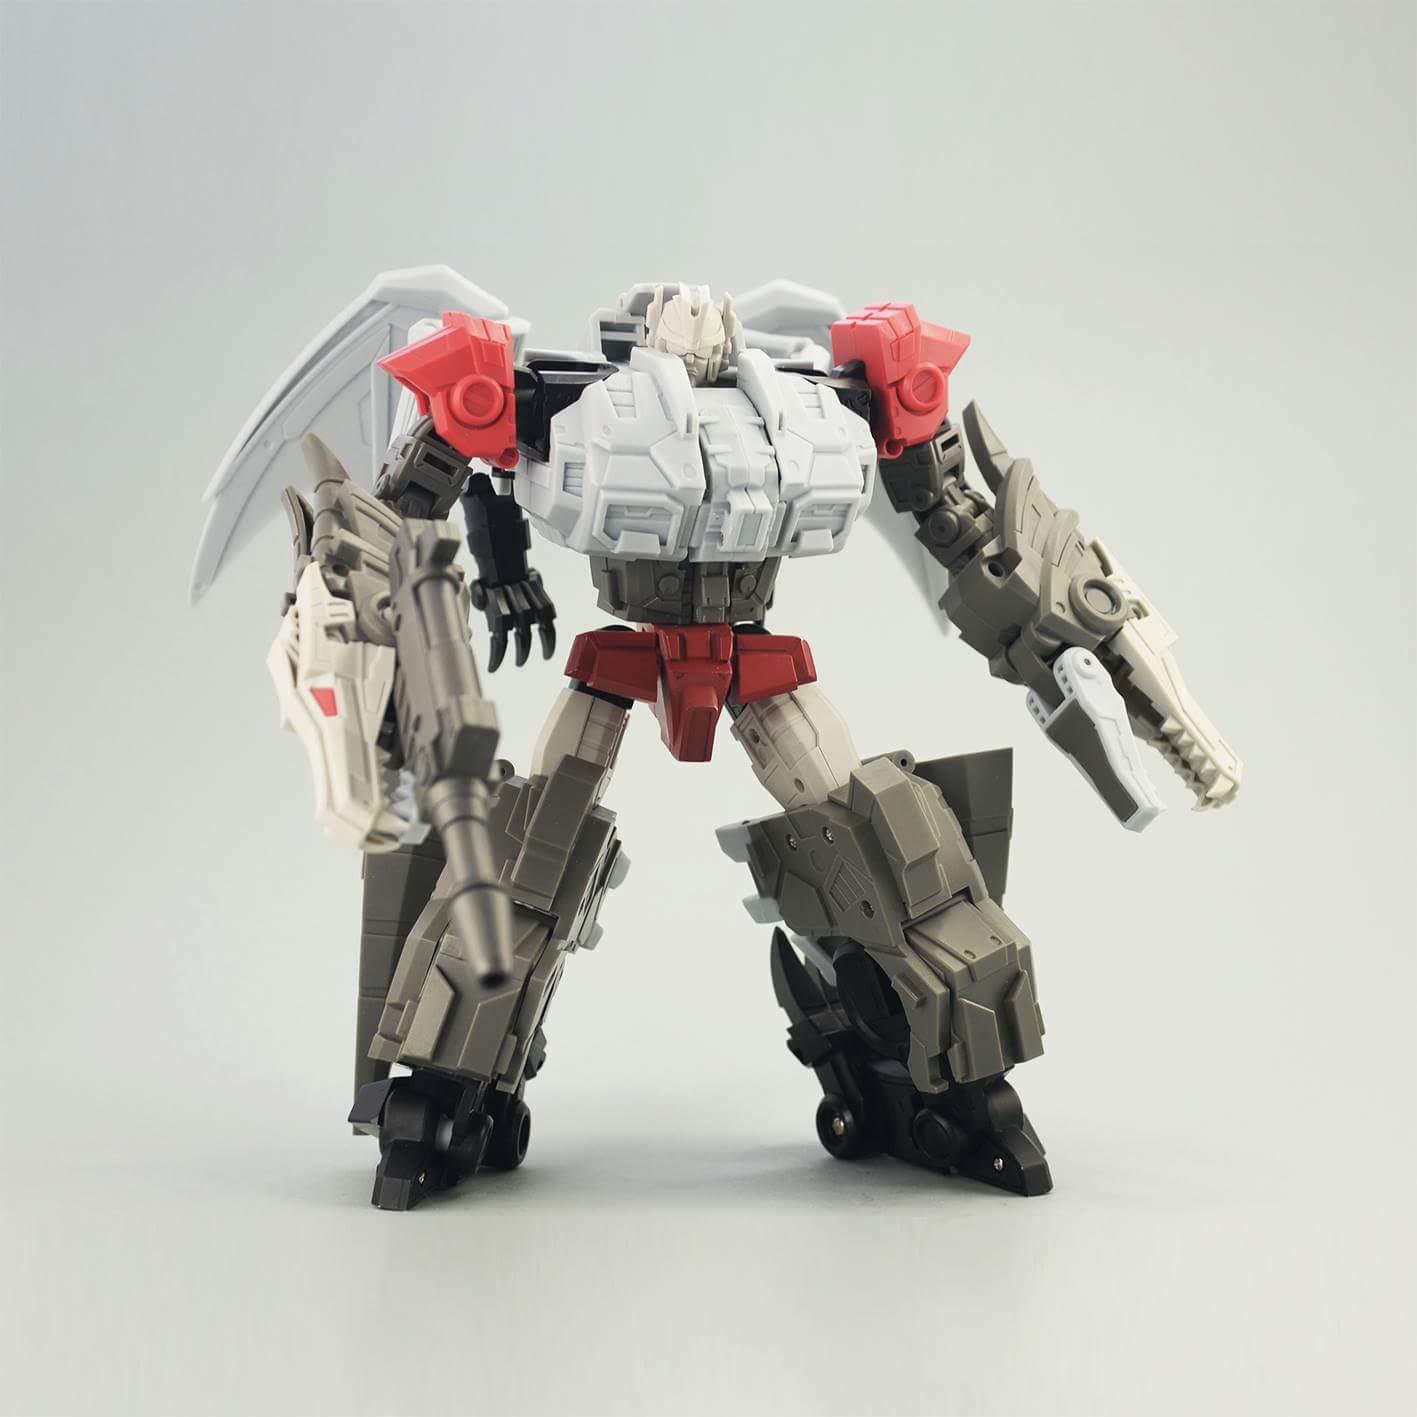 [FansHobby] Produit Tiers - Master Builder MB-02/03/05 - aka Monsterbots/Monstrebots - Page 2 M1sJlFuy